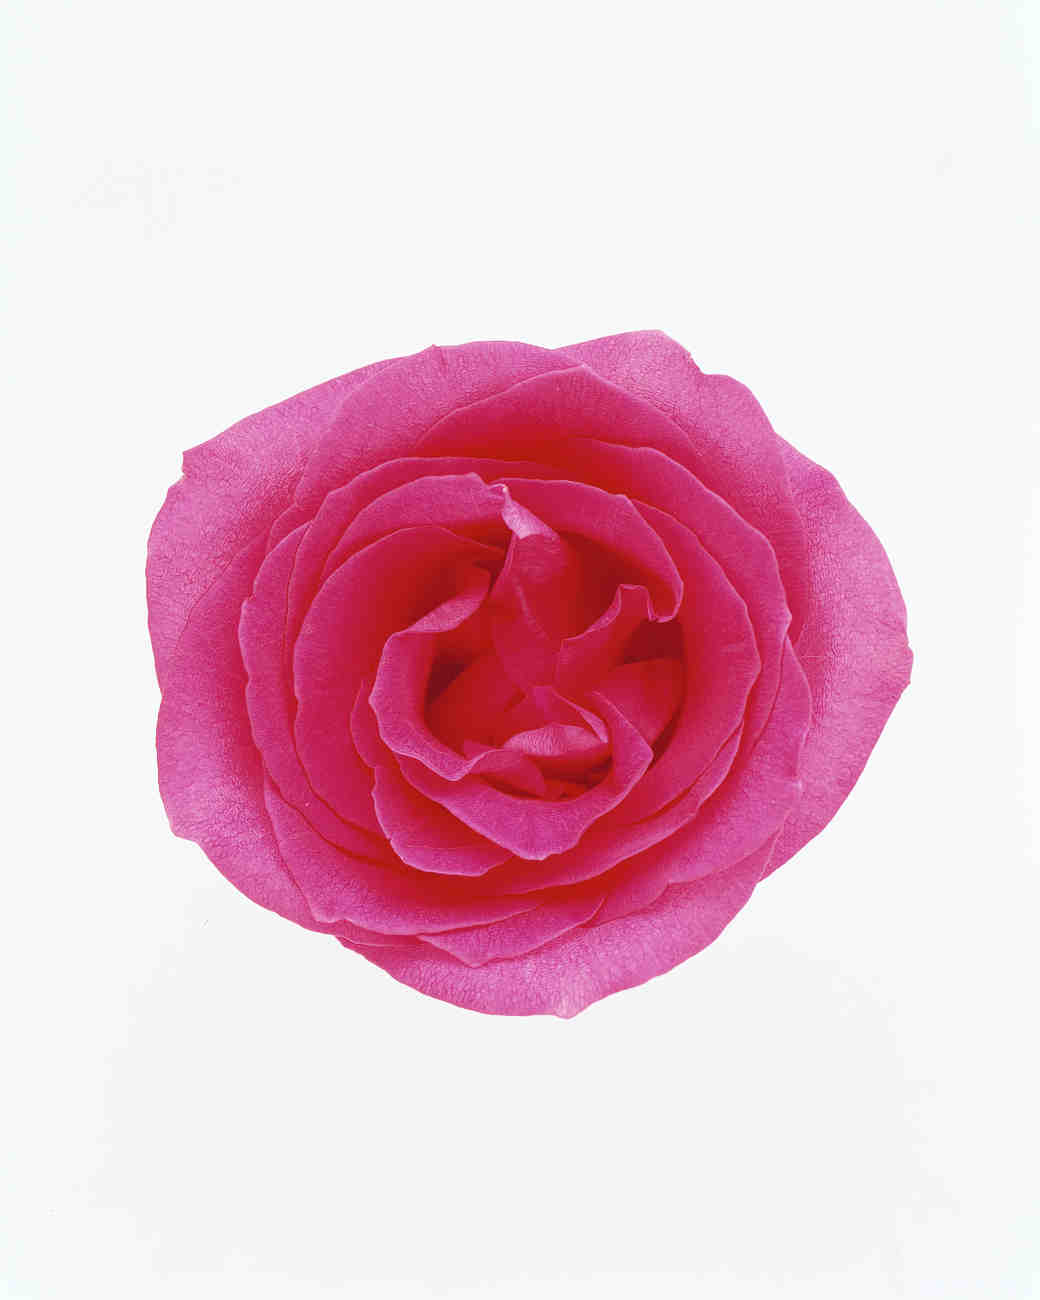 flower-glossary-rose-ravel-pink-a98432-0415.jpg